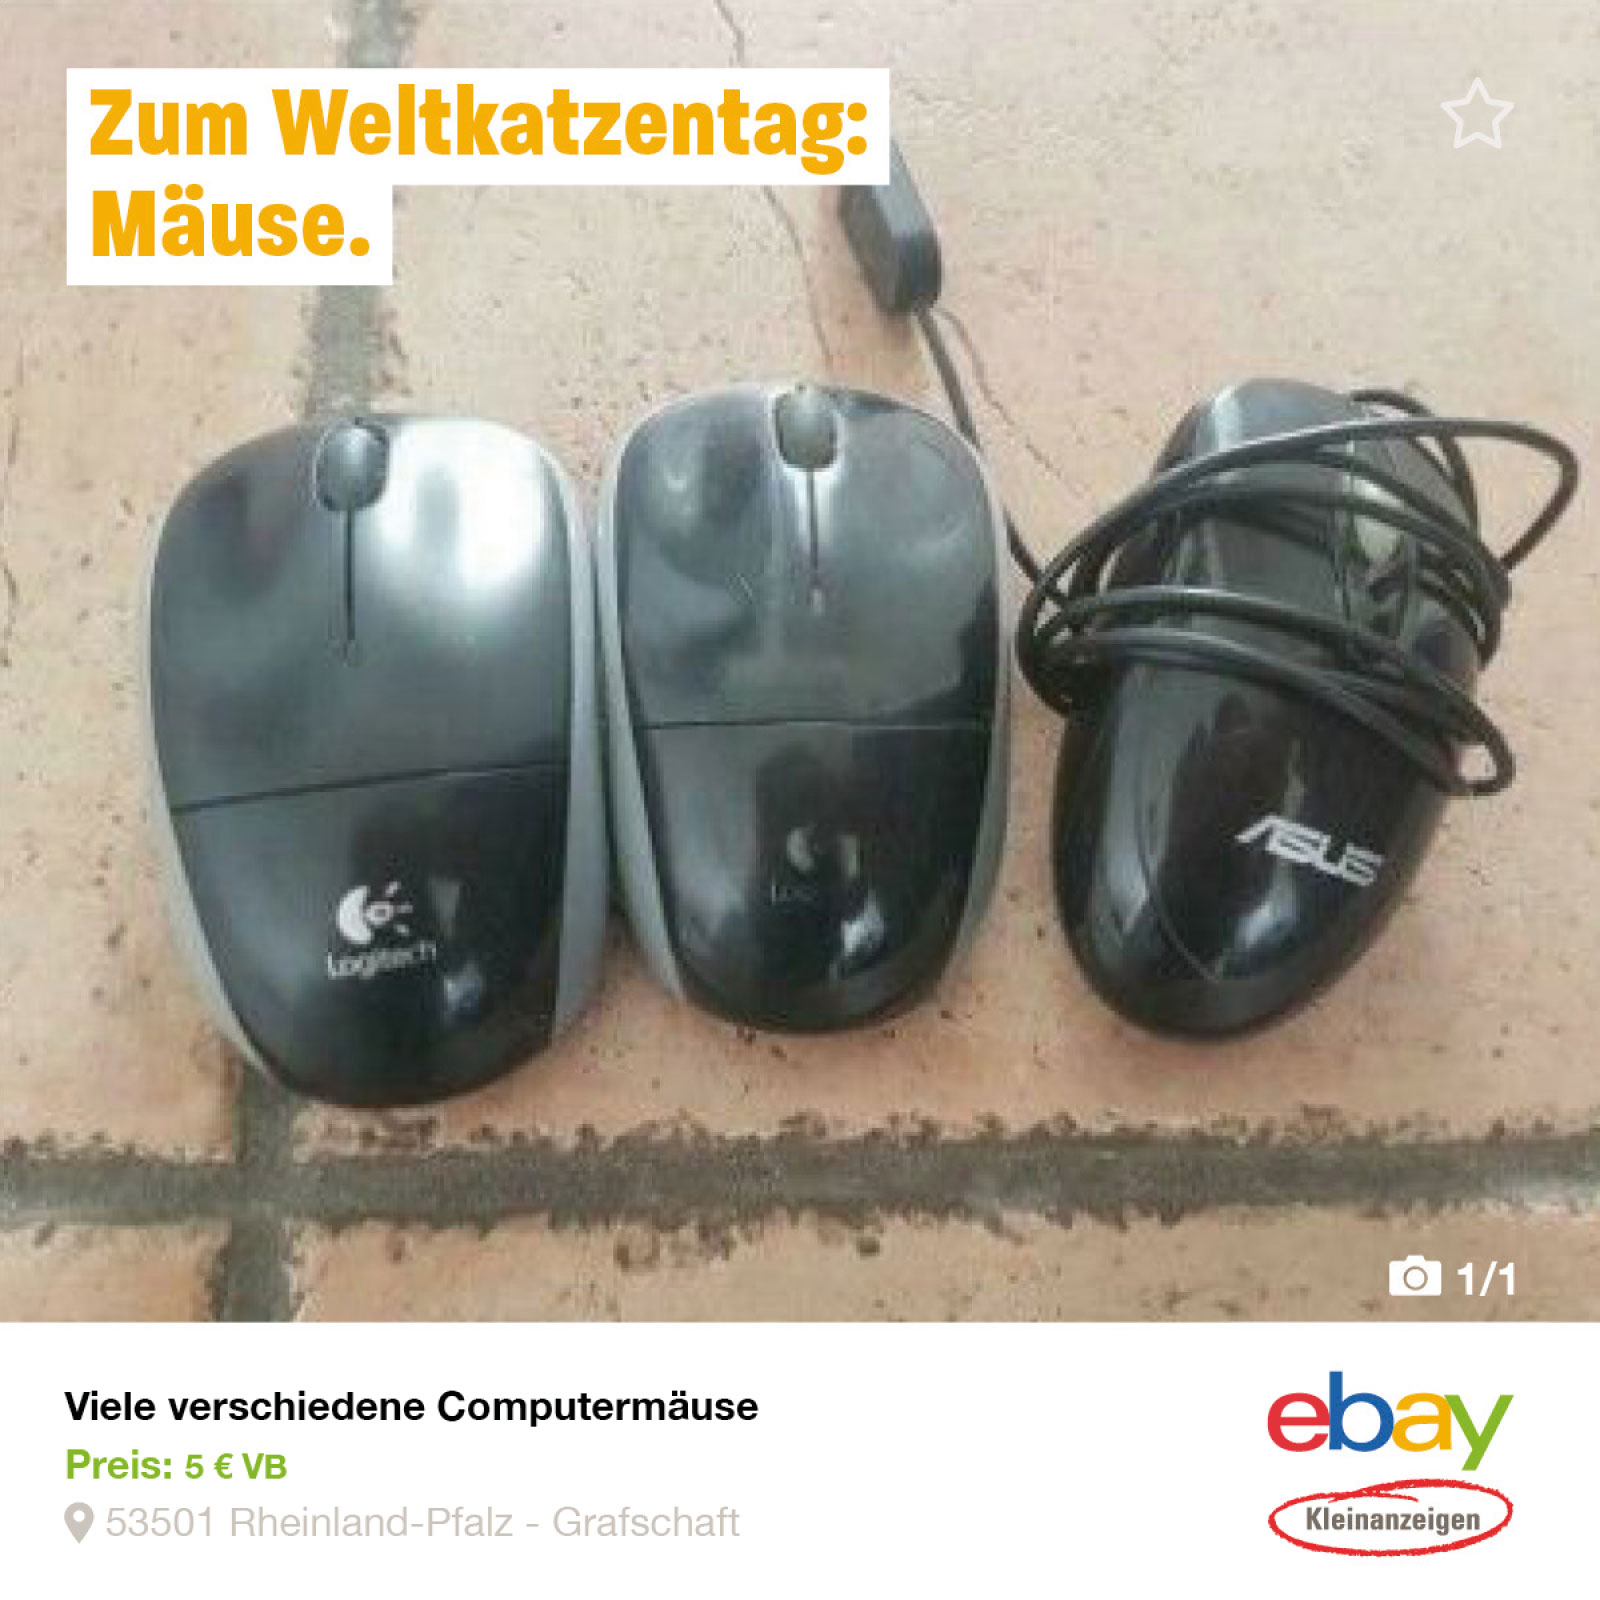 ebay_postings_14x14_rz_5